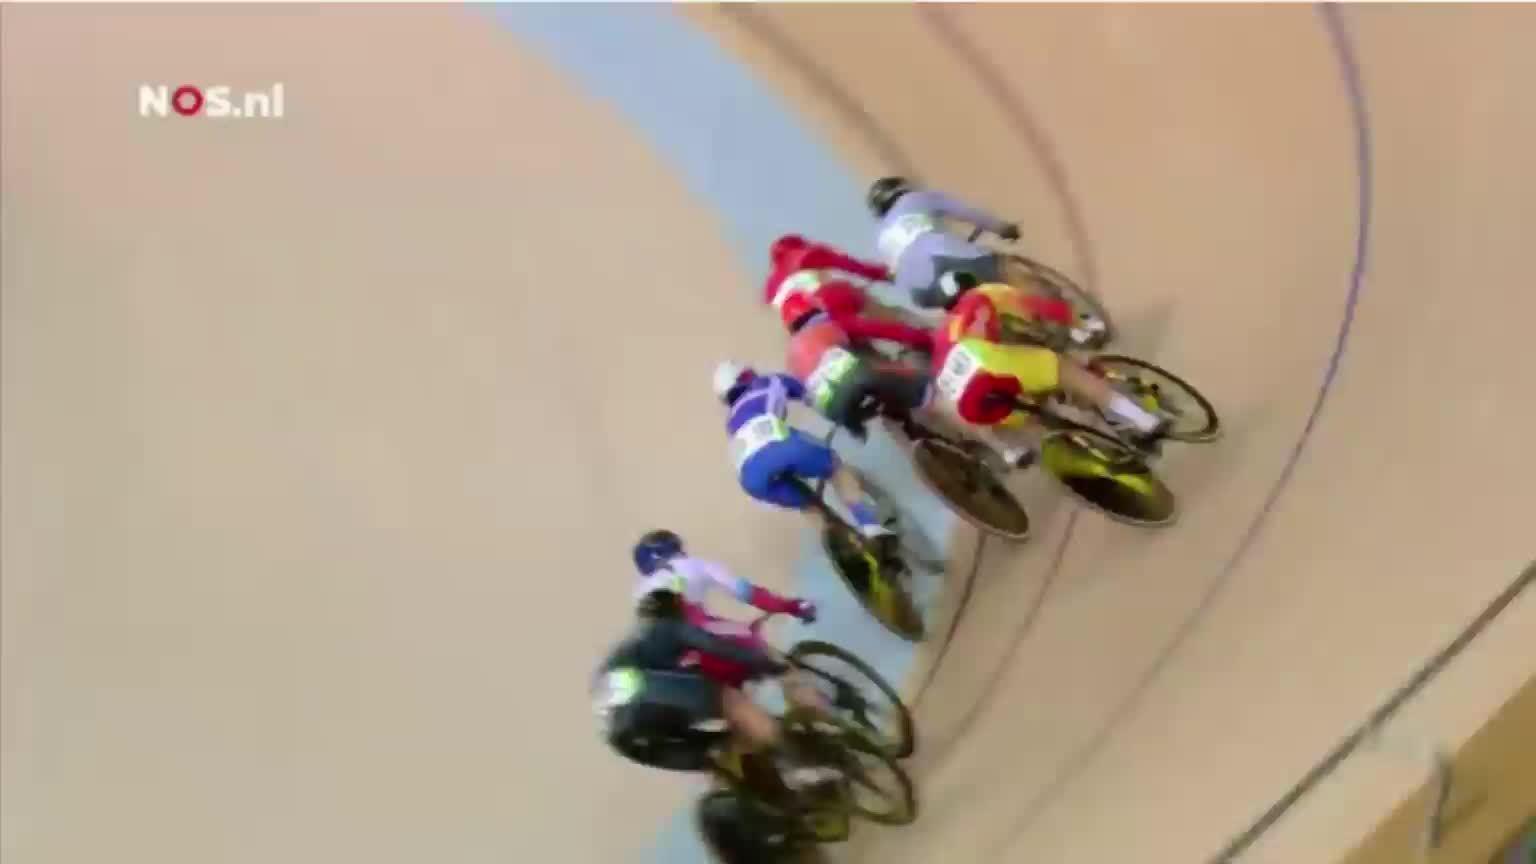 olymgifs, olympics, rio2016, Dutch indoor cyclist Laurine van Riessen almost leaves track GIFs